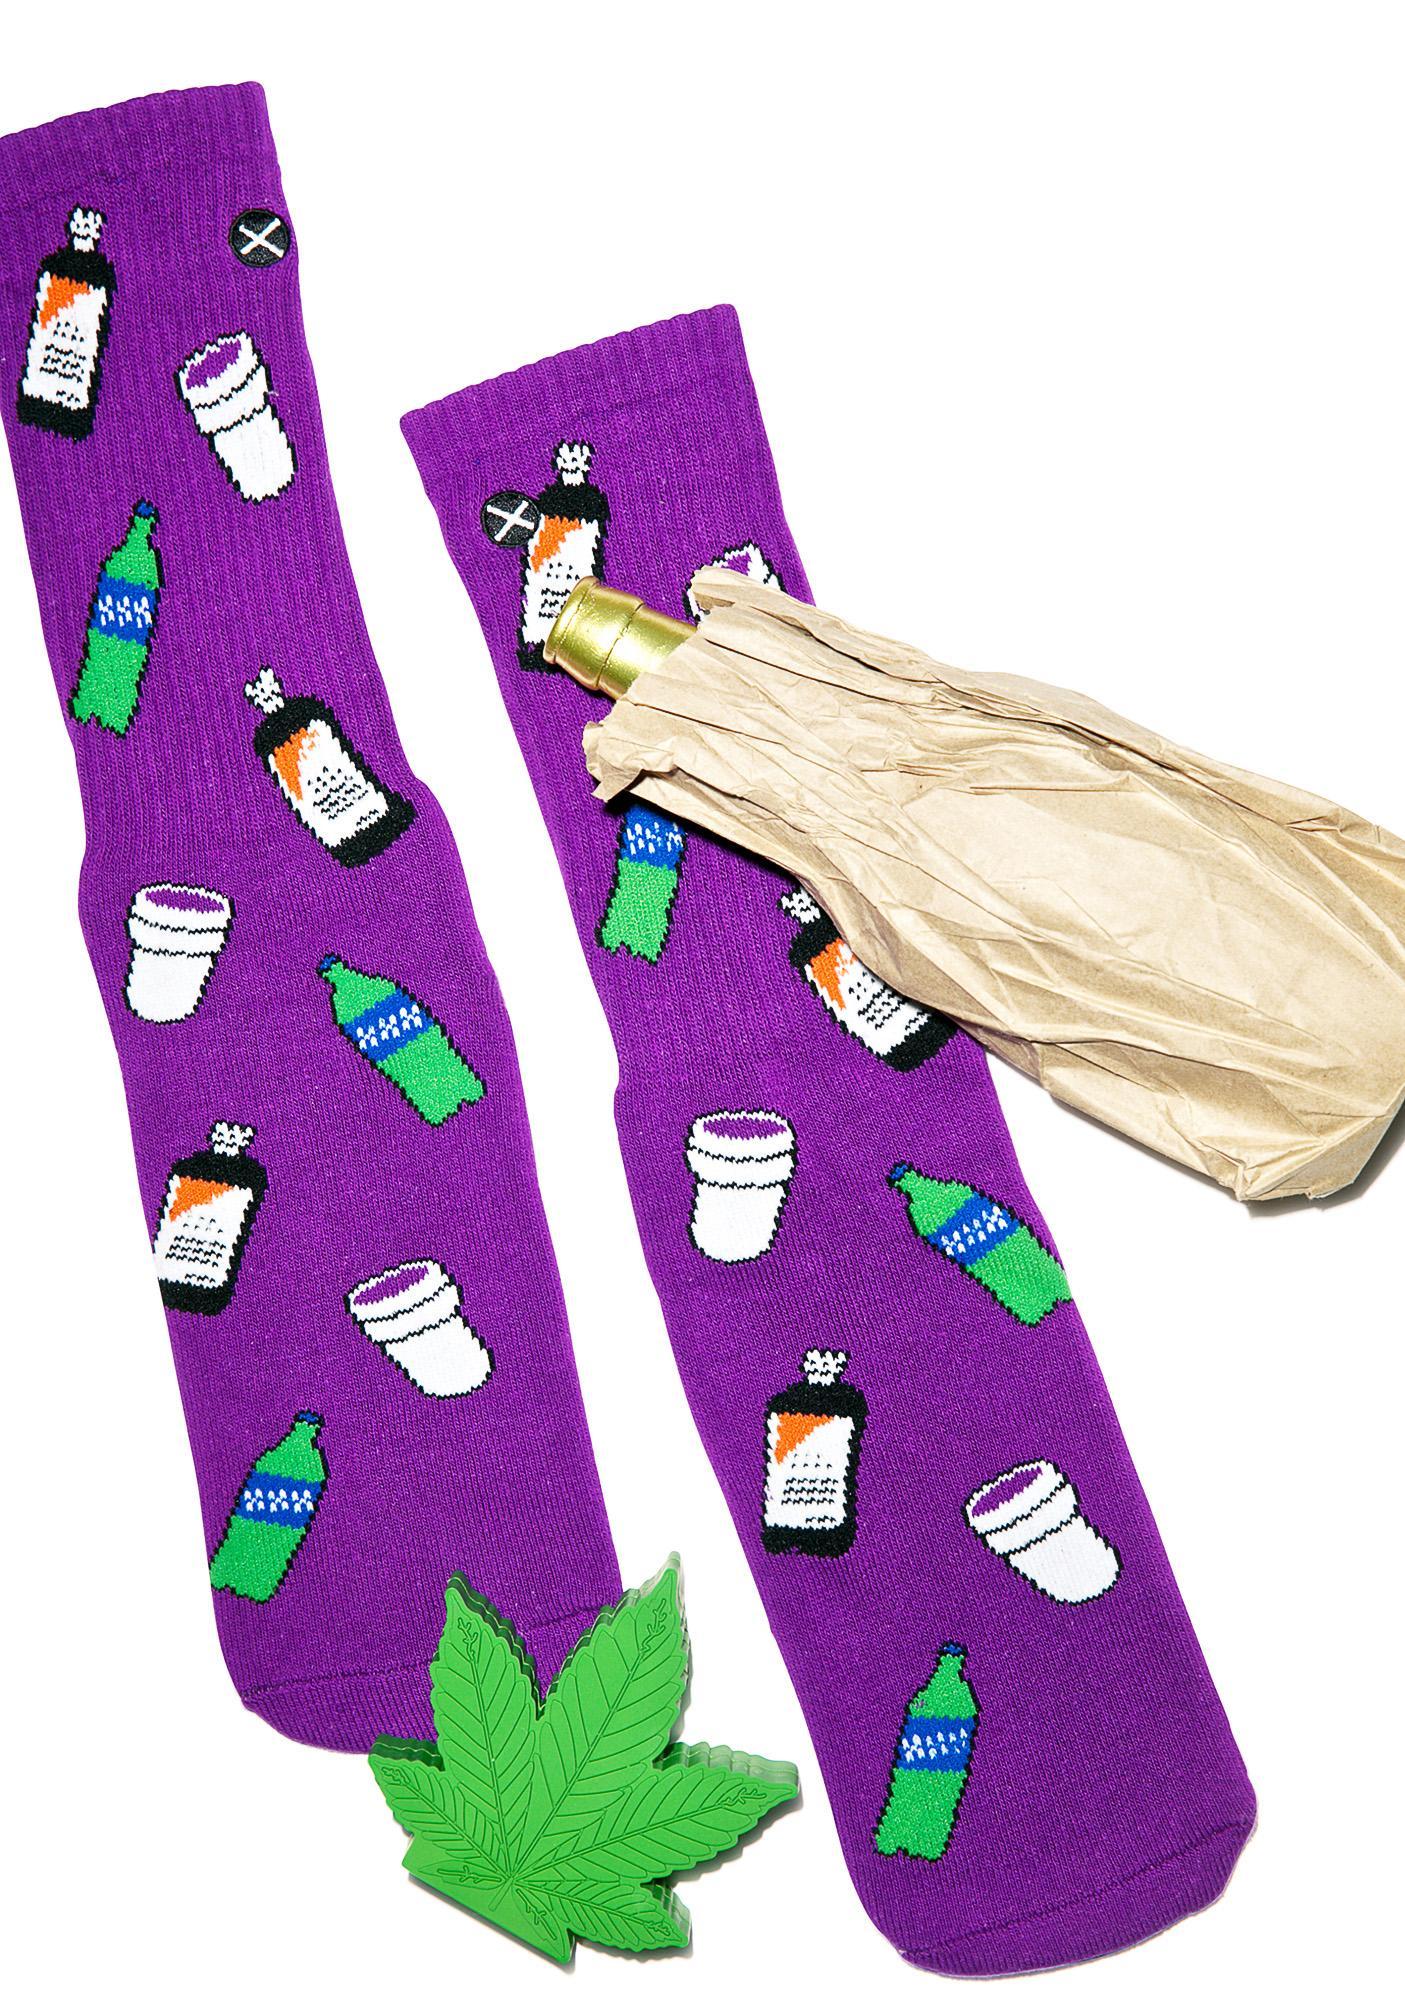 Odd Sox Codeine Crazy Socks